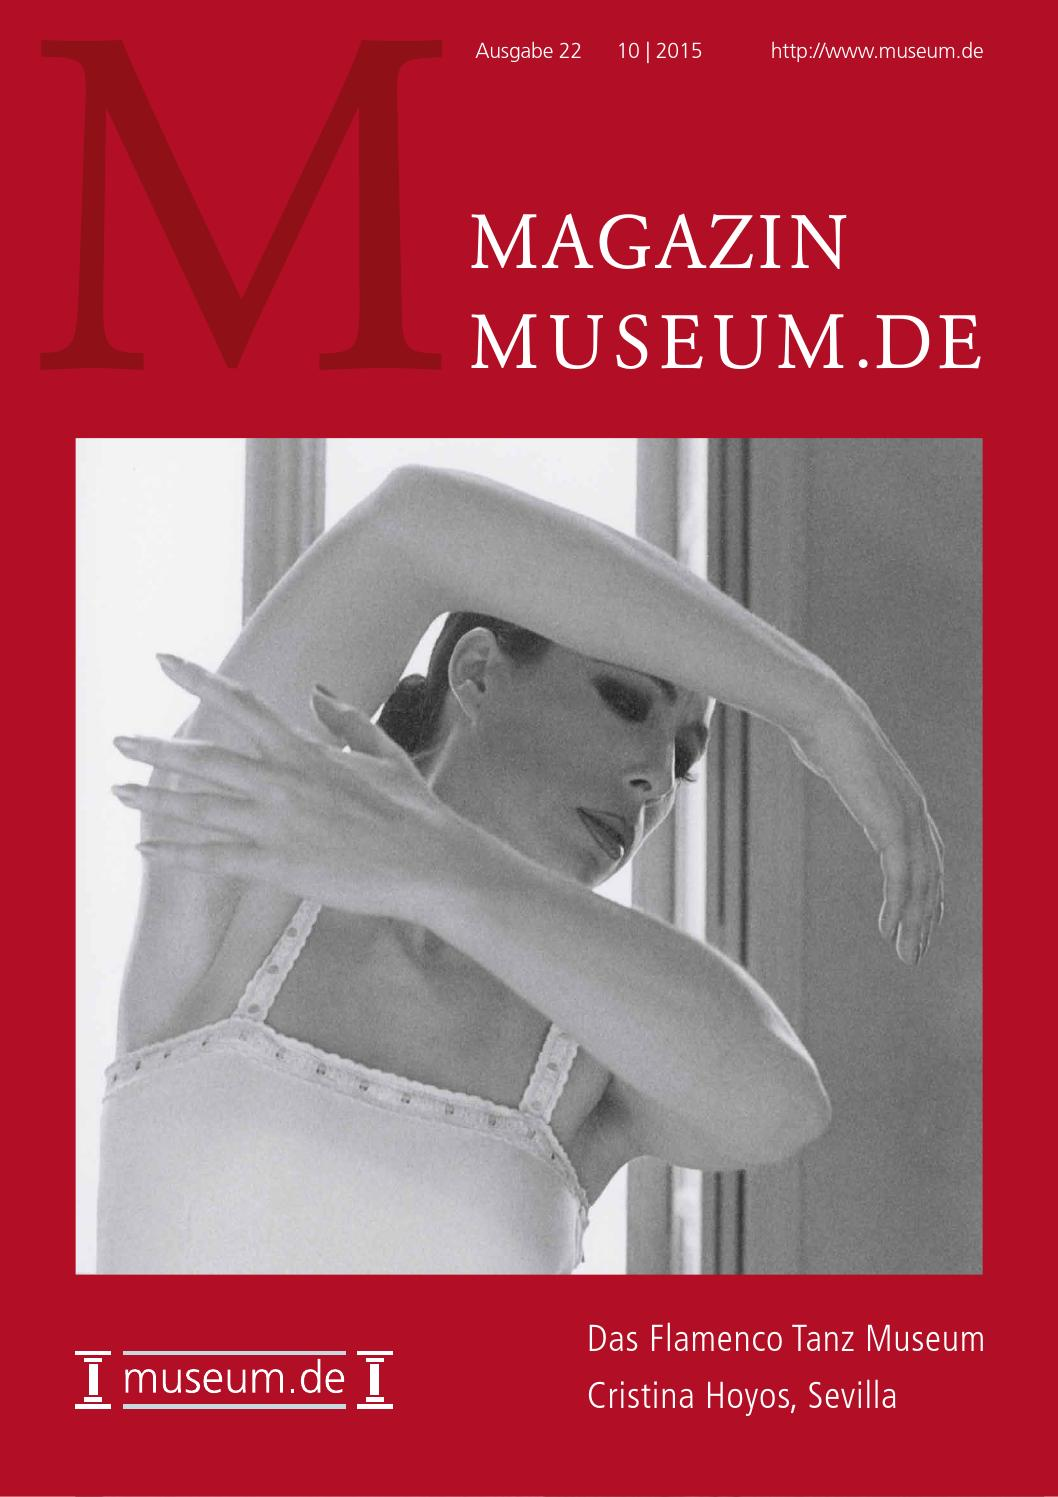 Magazin Museum.de Nr. 22 by museum.de - issuu